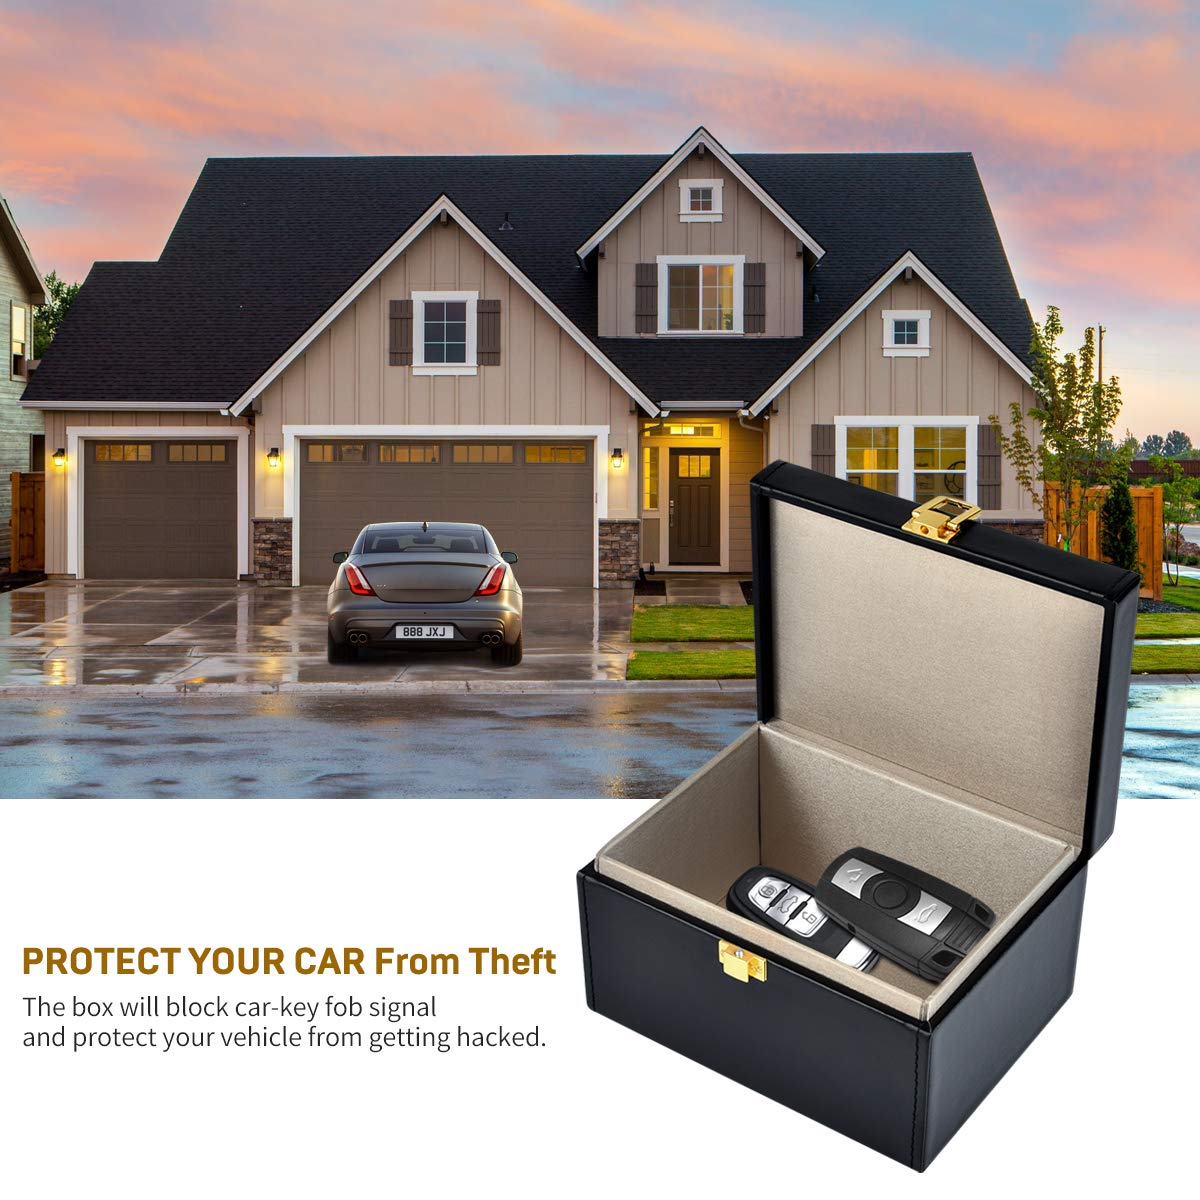 Miavogo Faraday Box for Car Keys RFID Signal Blocker Box Anti-Theft Faraday Pouch Bag Large for Keyless Cars Phones